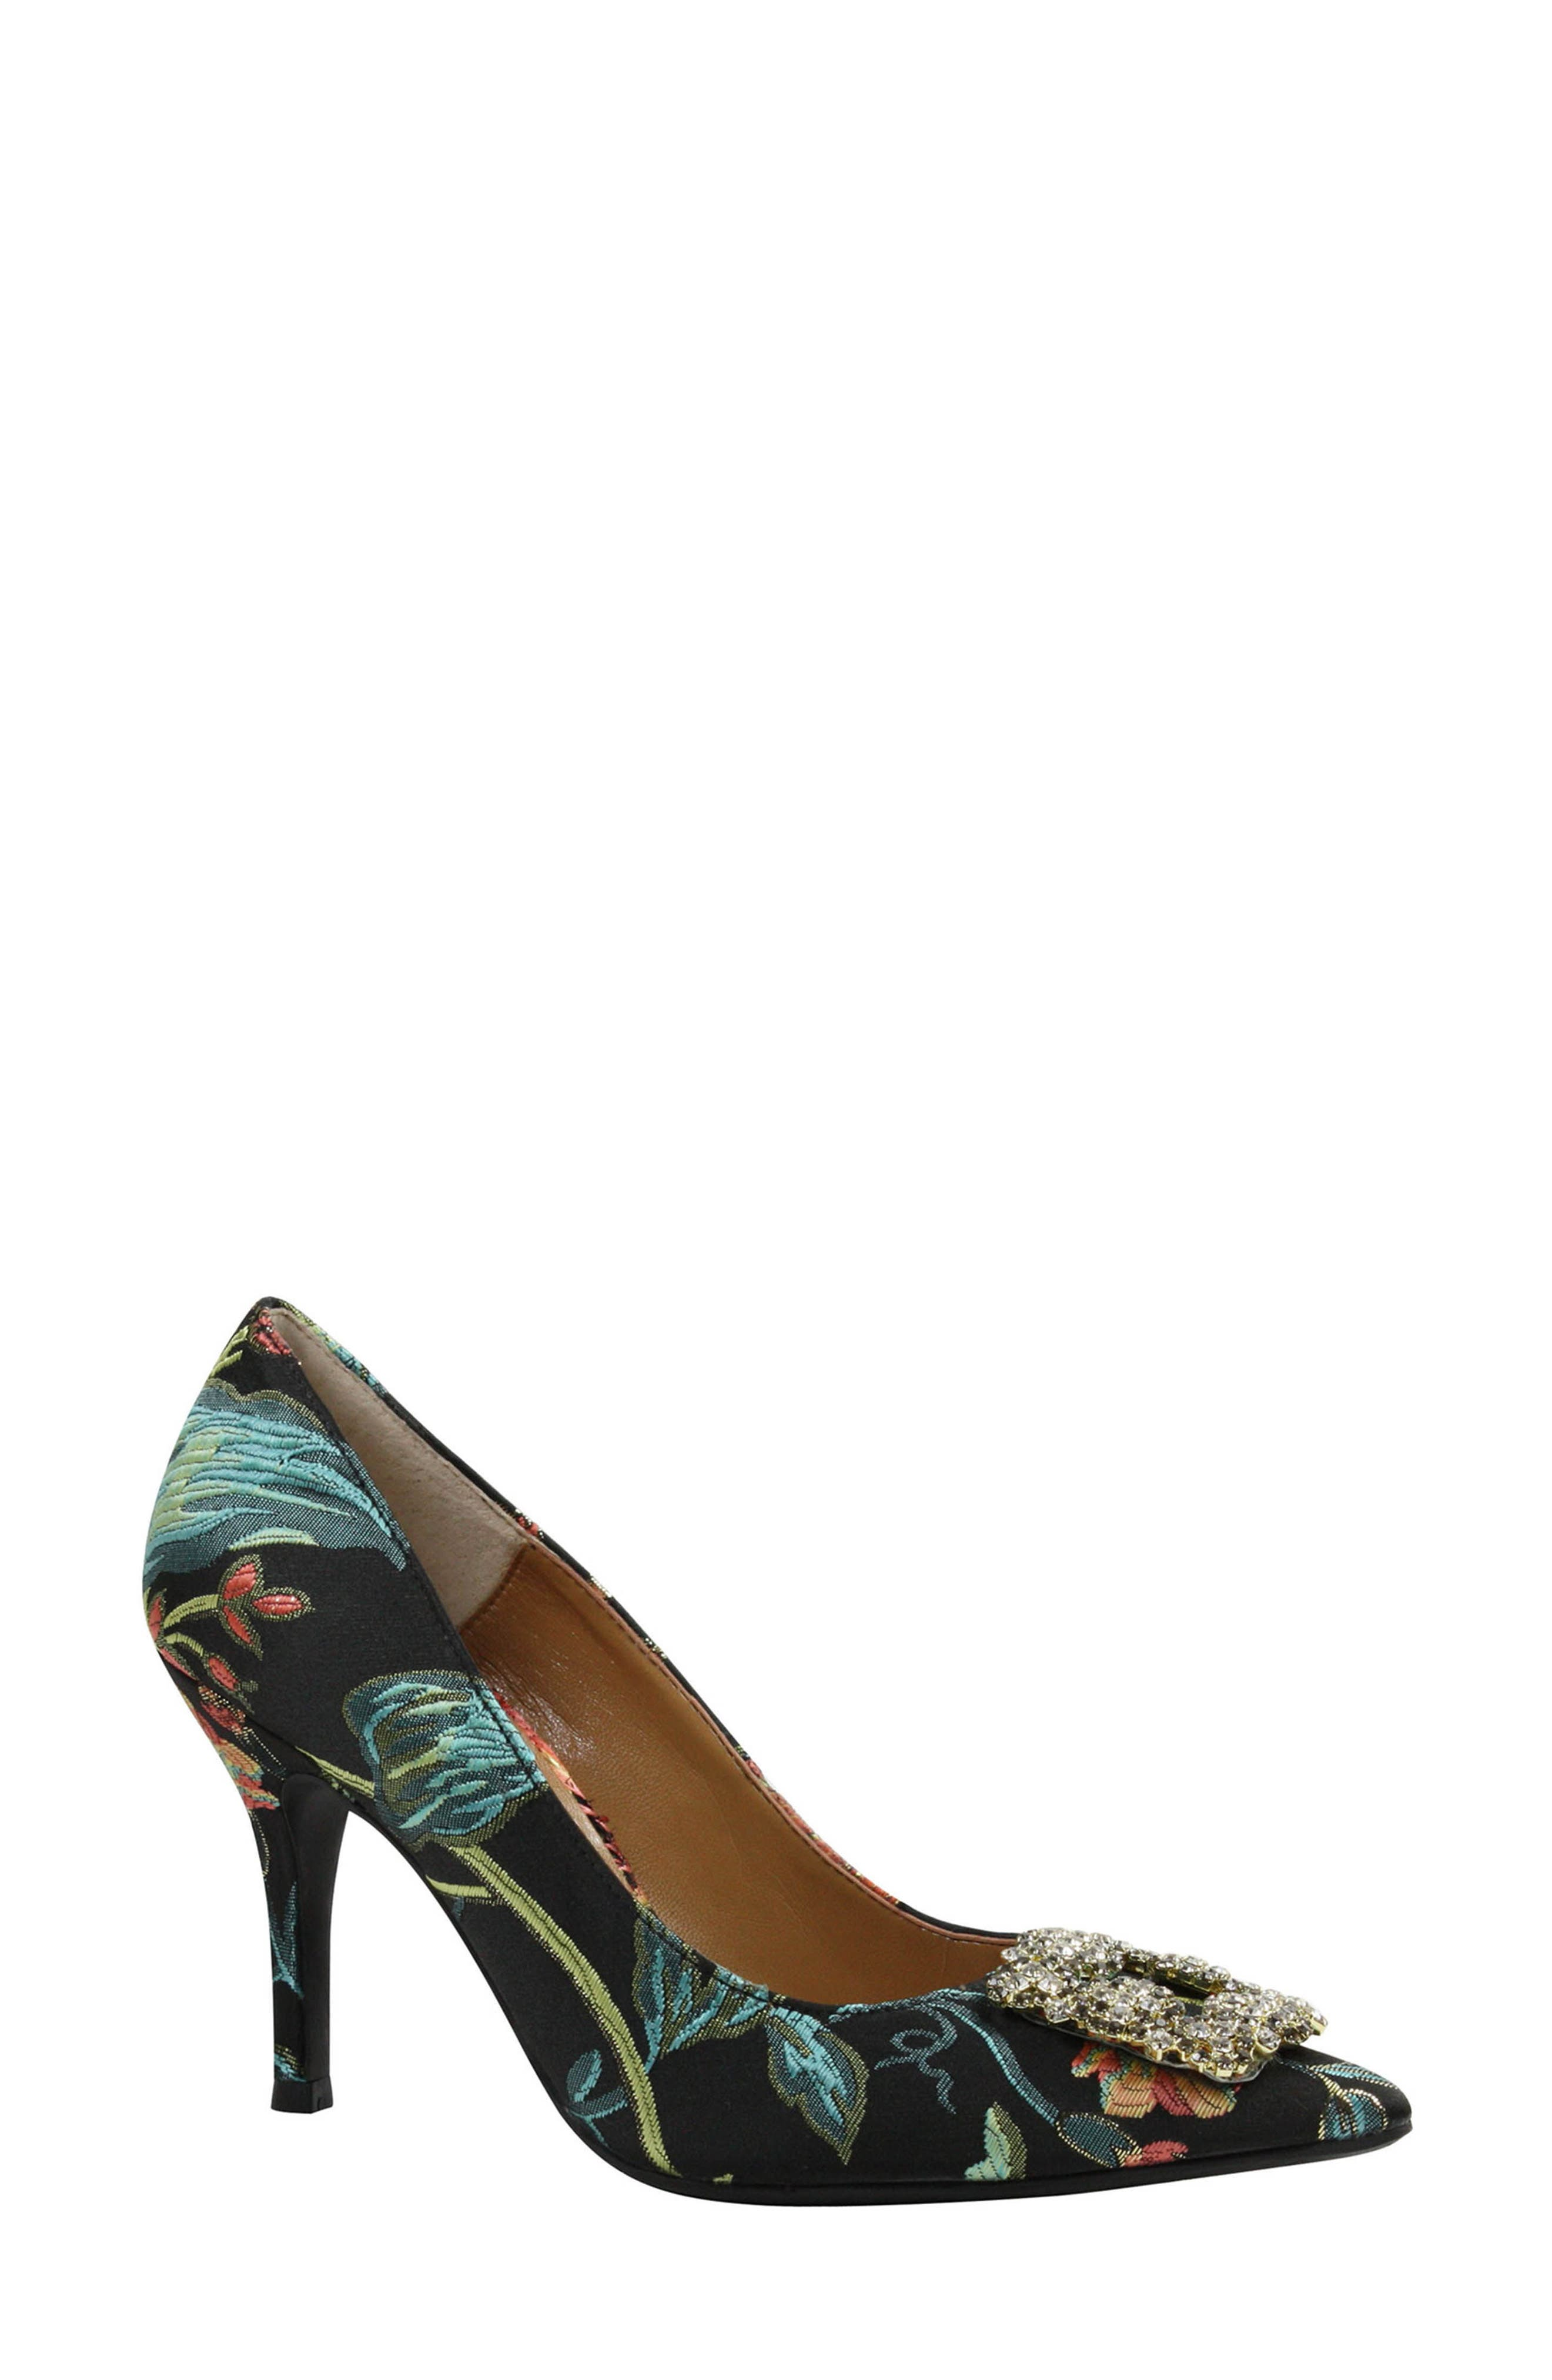 J.Reneé Bilboa Pointy Toe Pump,                             Main thumbnail 1, color,                             Black/ Teal/ Coral Fabric